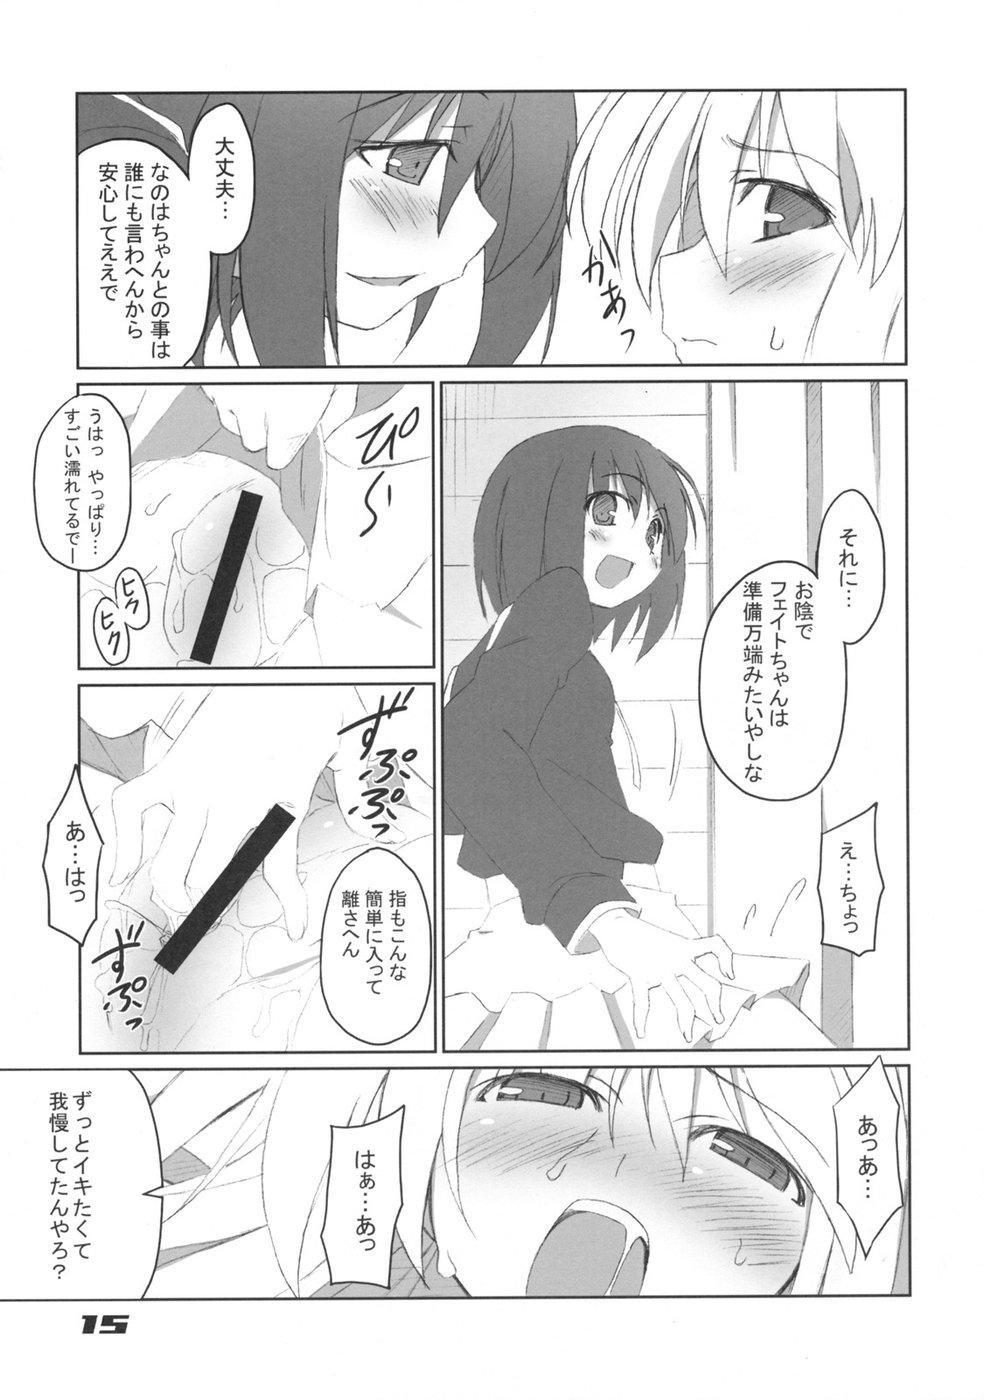 Fate-chan Igai to Moroi no A's 14